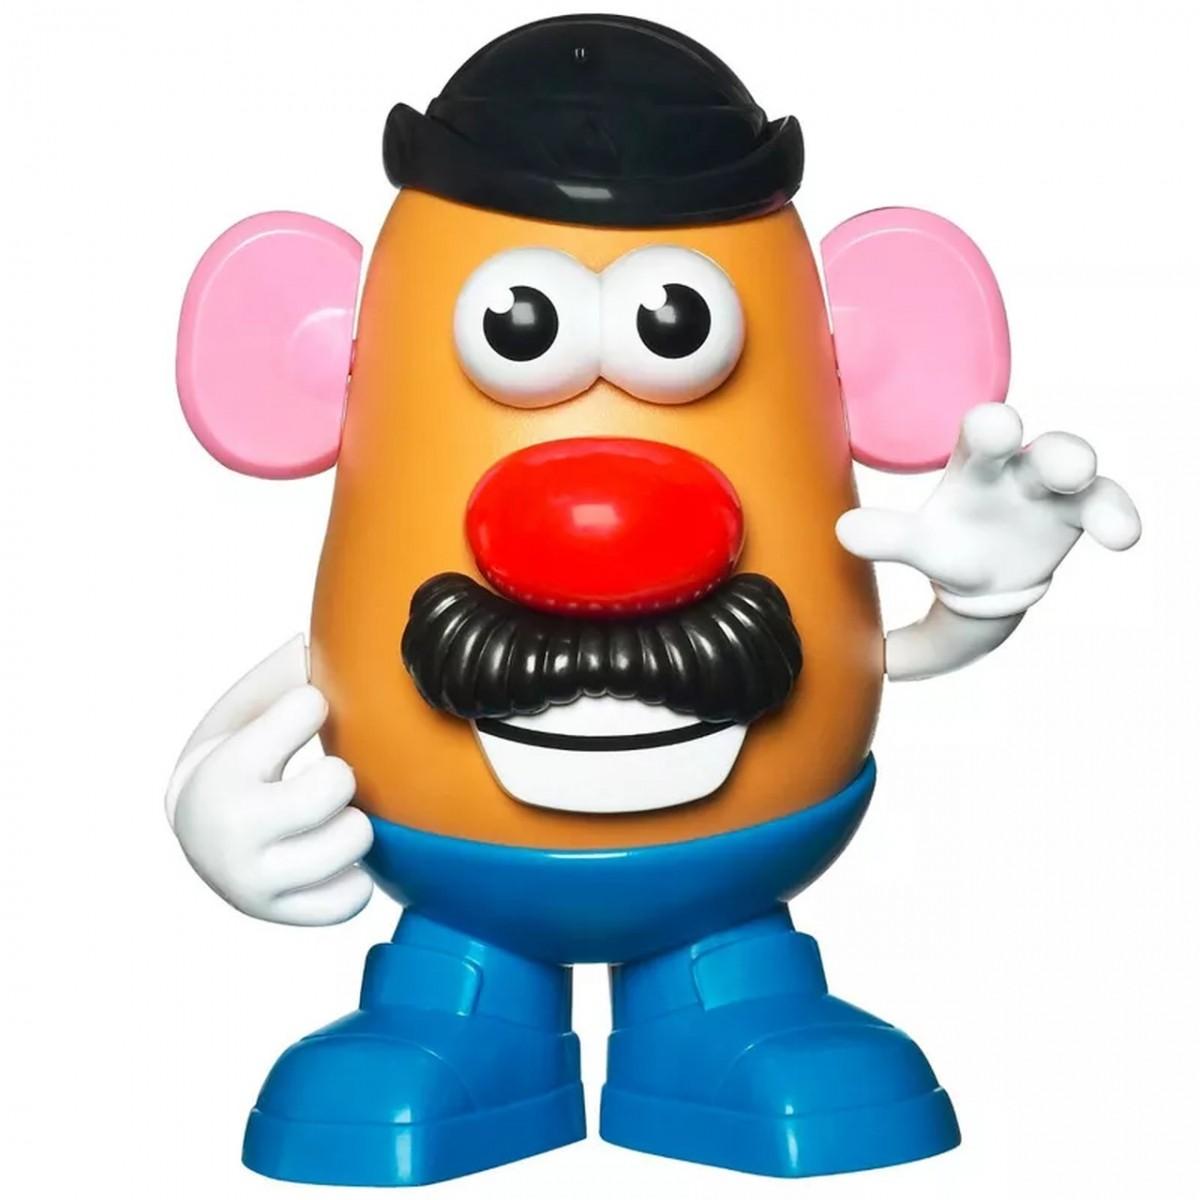 Boneco Sr. Cabeça de Batata (M. Patate): Mrs. Potato Head